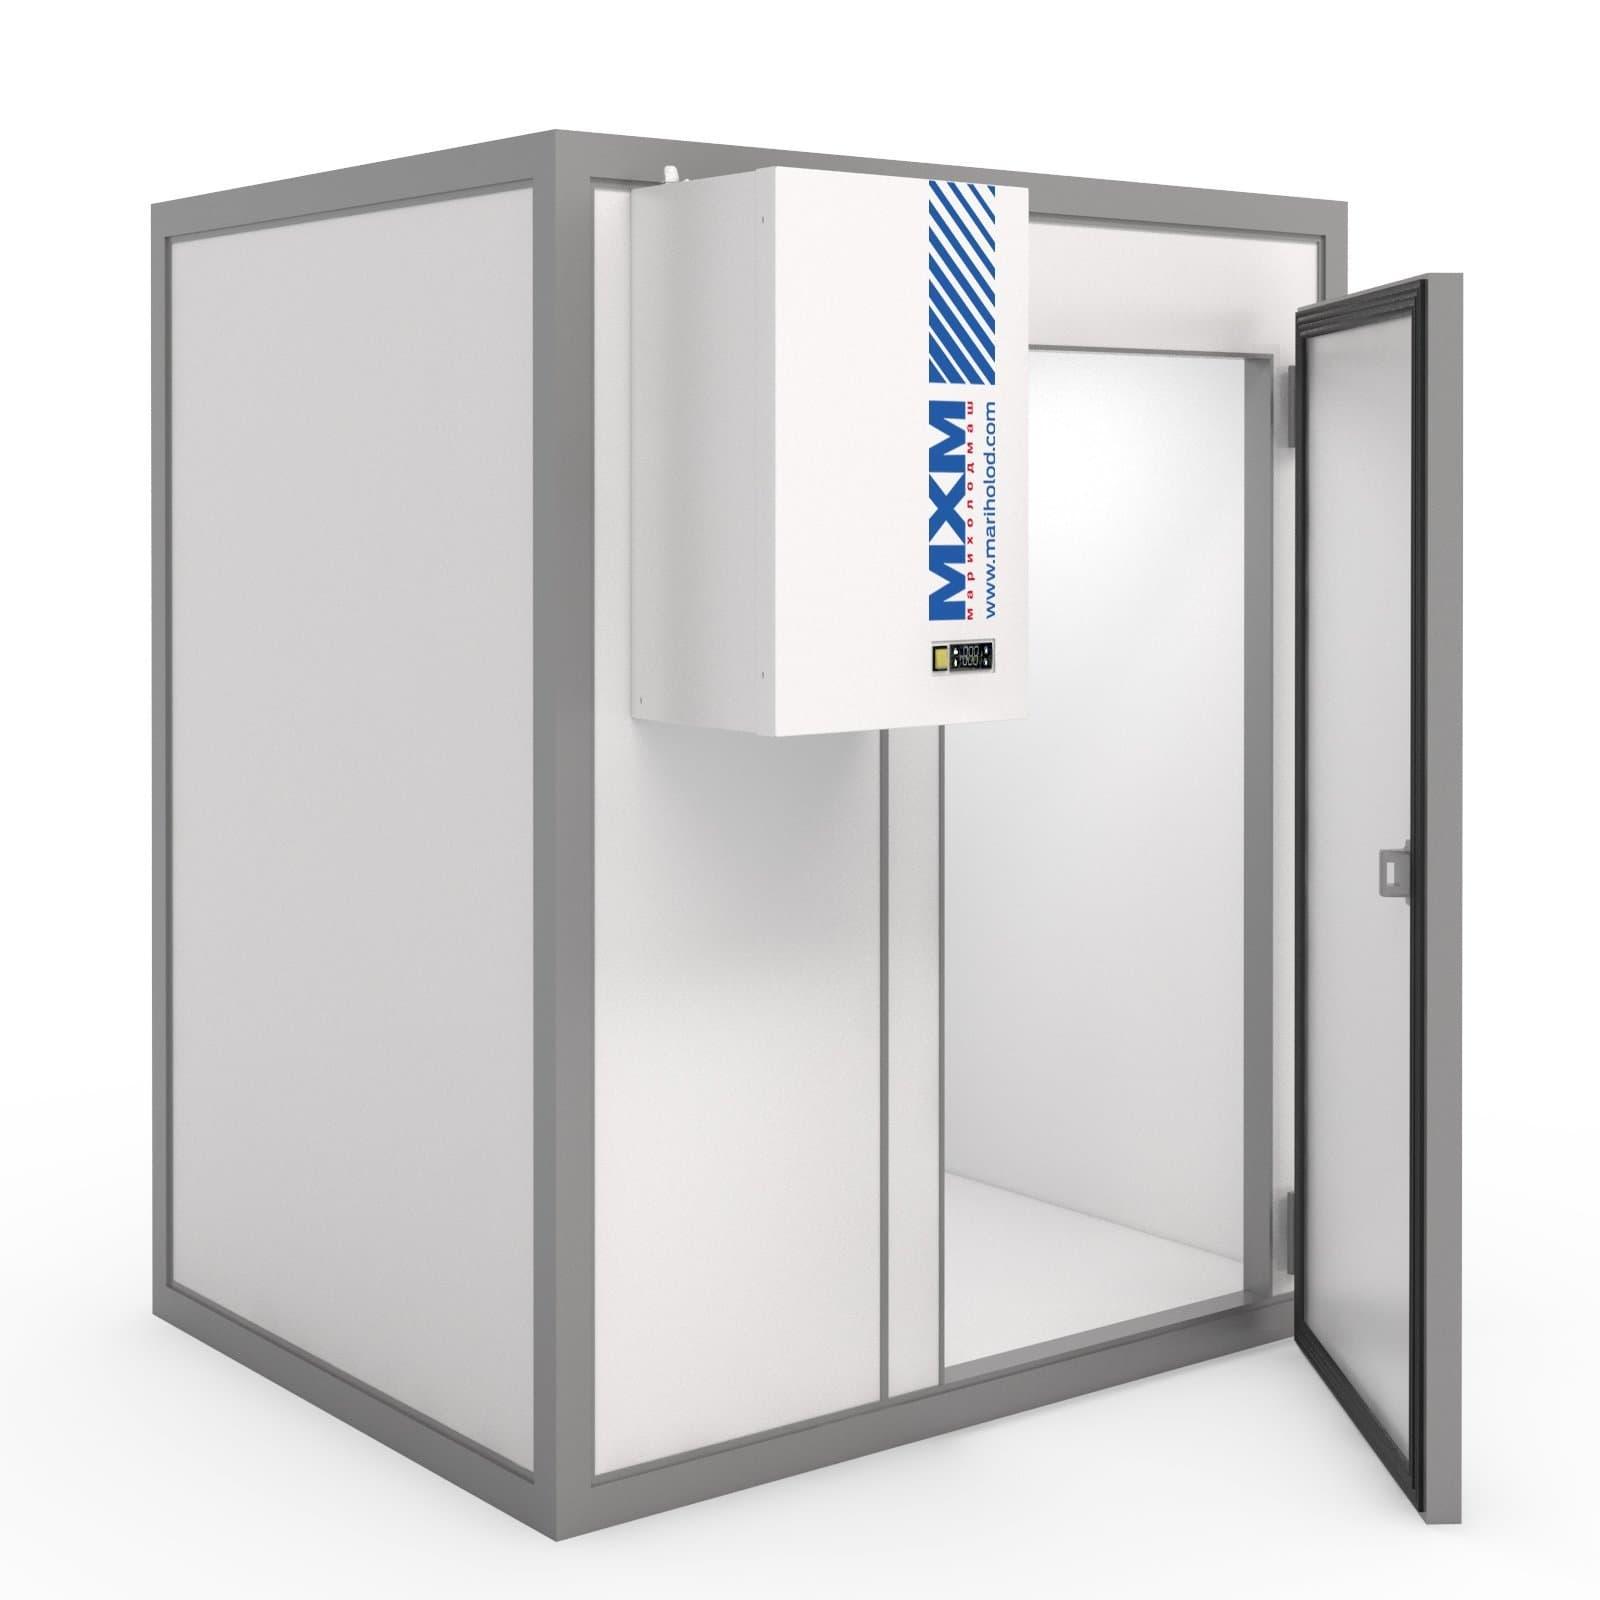 Камера холодильная КХН-84,79 (2560×13960×2720 мм)